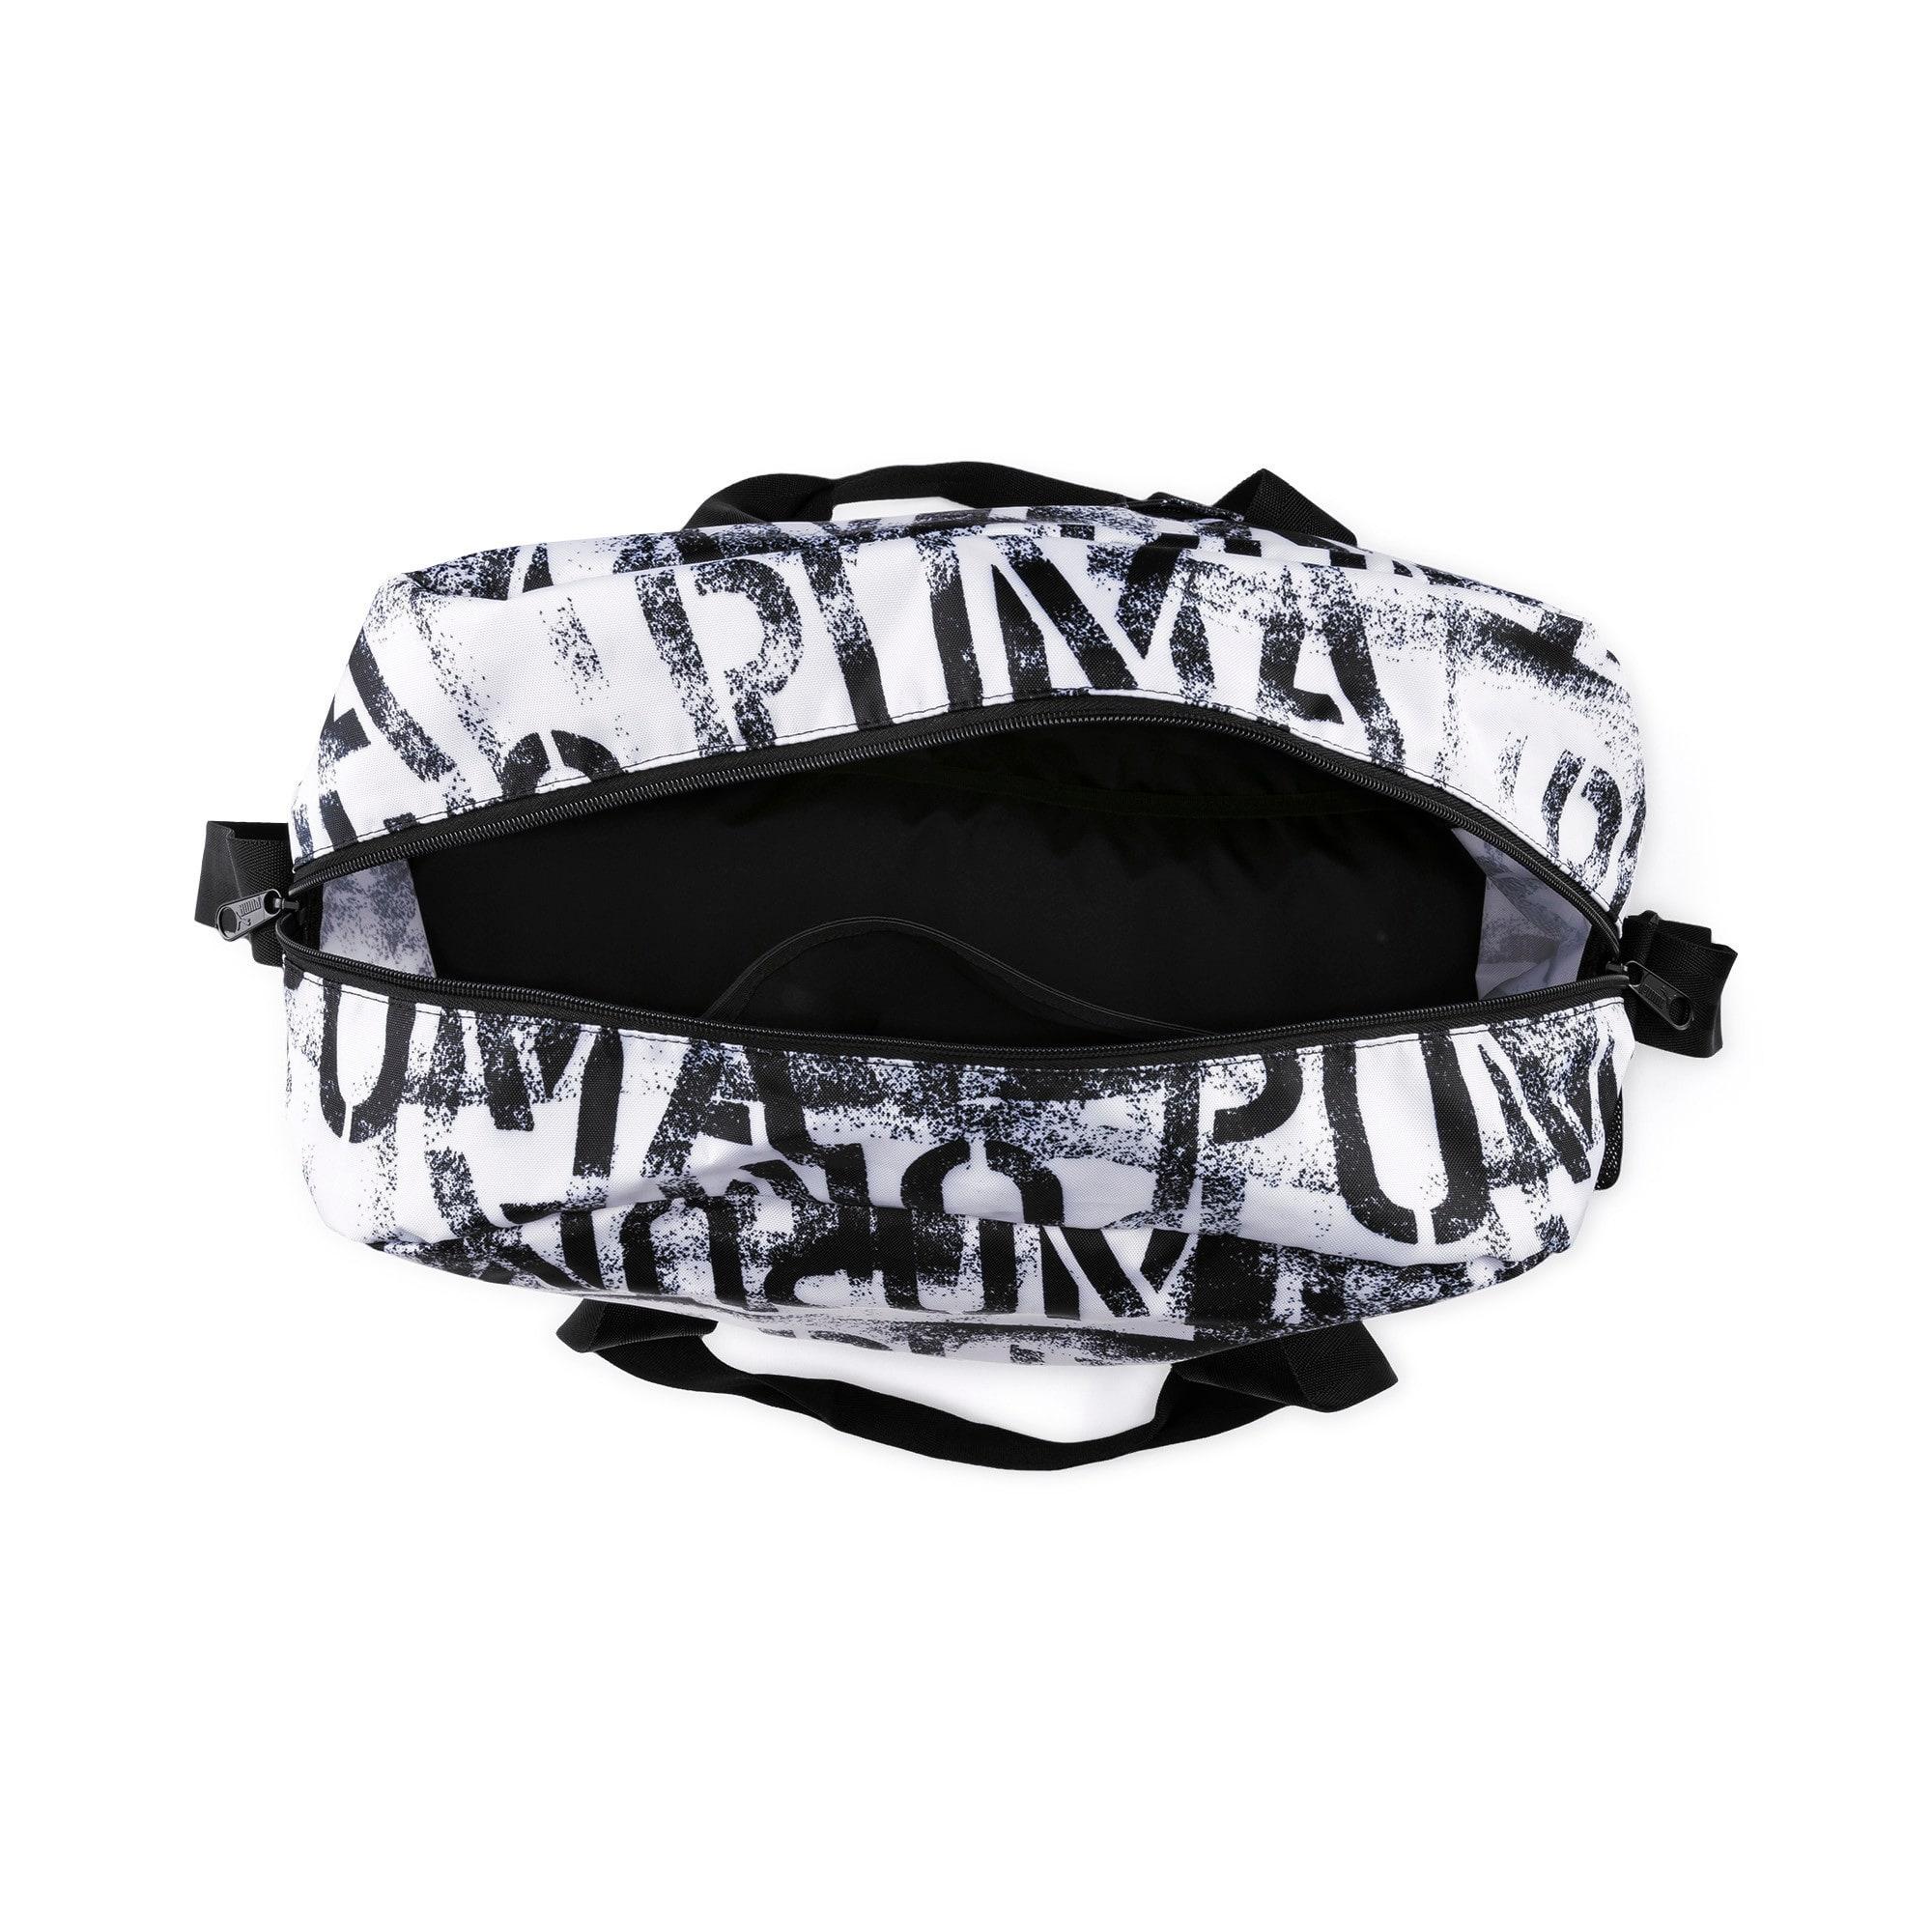 Thumbnail 4 of AT ESS Grip Bag, Puma White-Puma Black-AOP, medium